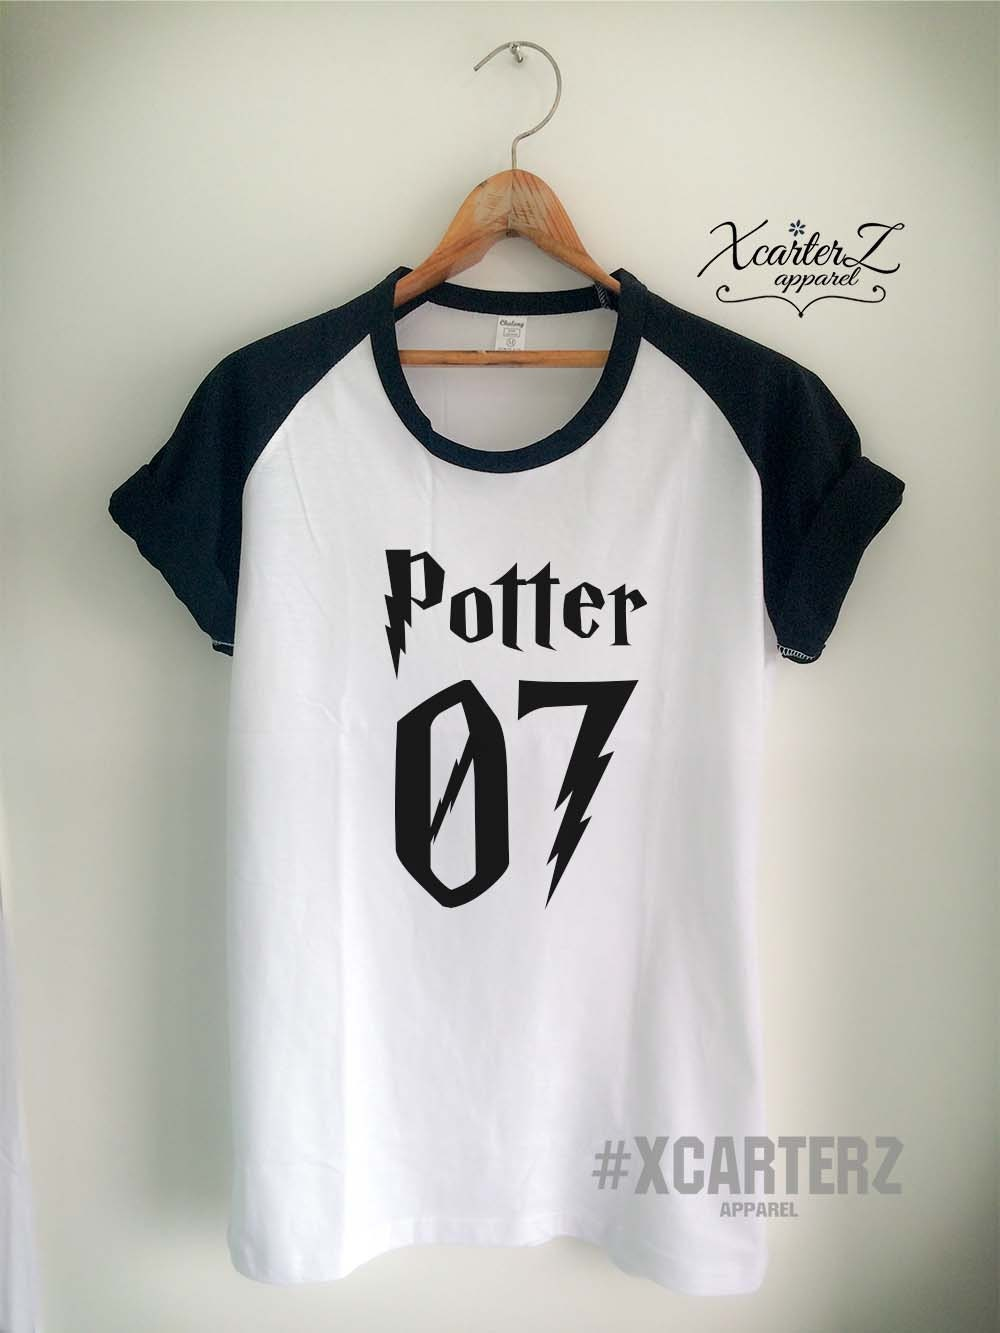 Potter Shirt Potter07 Merch Potter T Shirt Print on Front or Back side for  Women Girls Men Tumblr Baseball Top Tee Jersey White/Grey